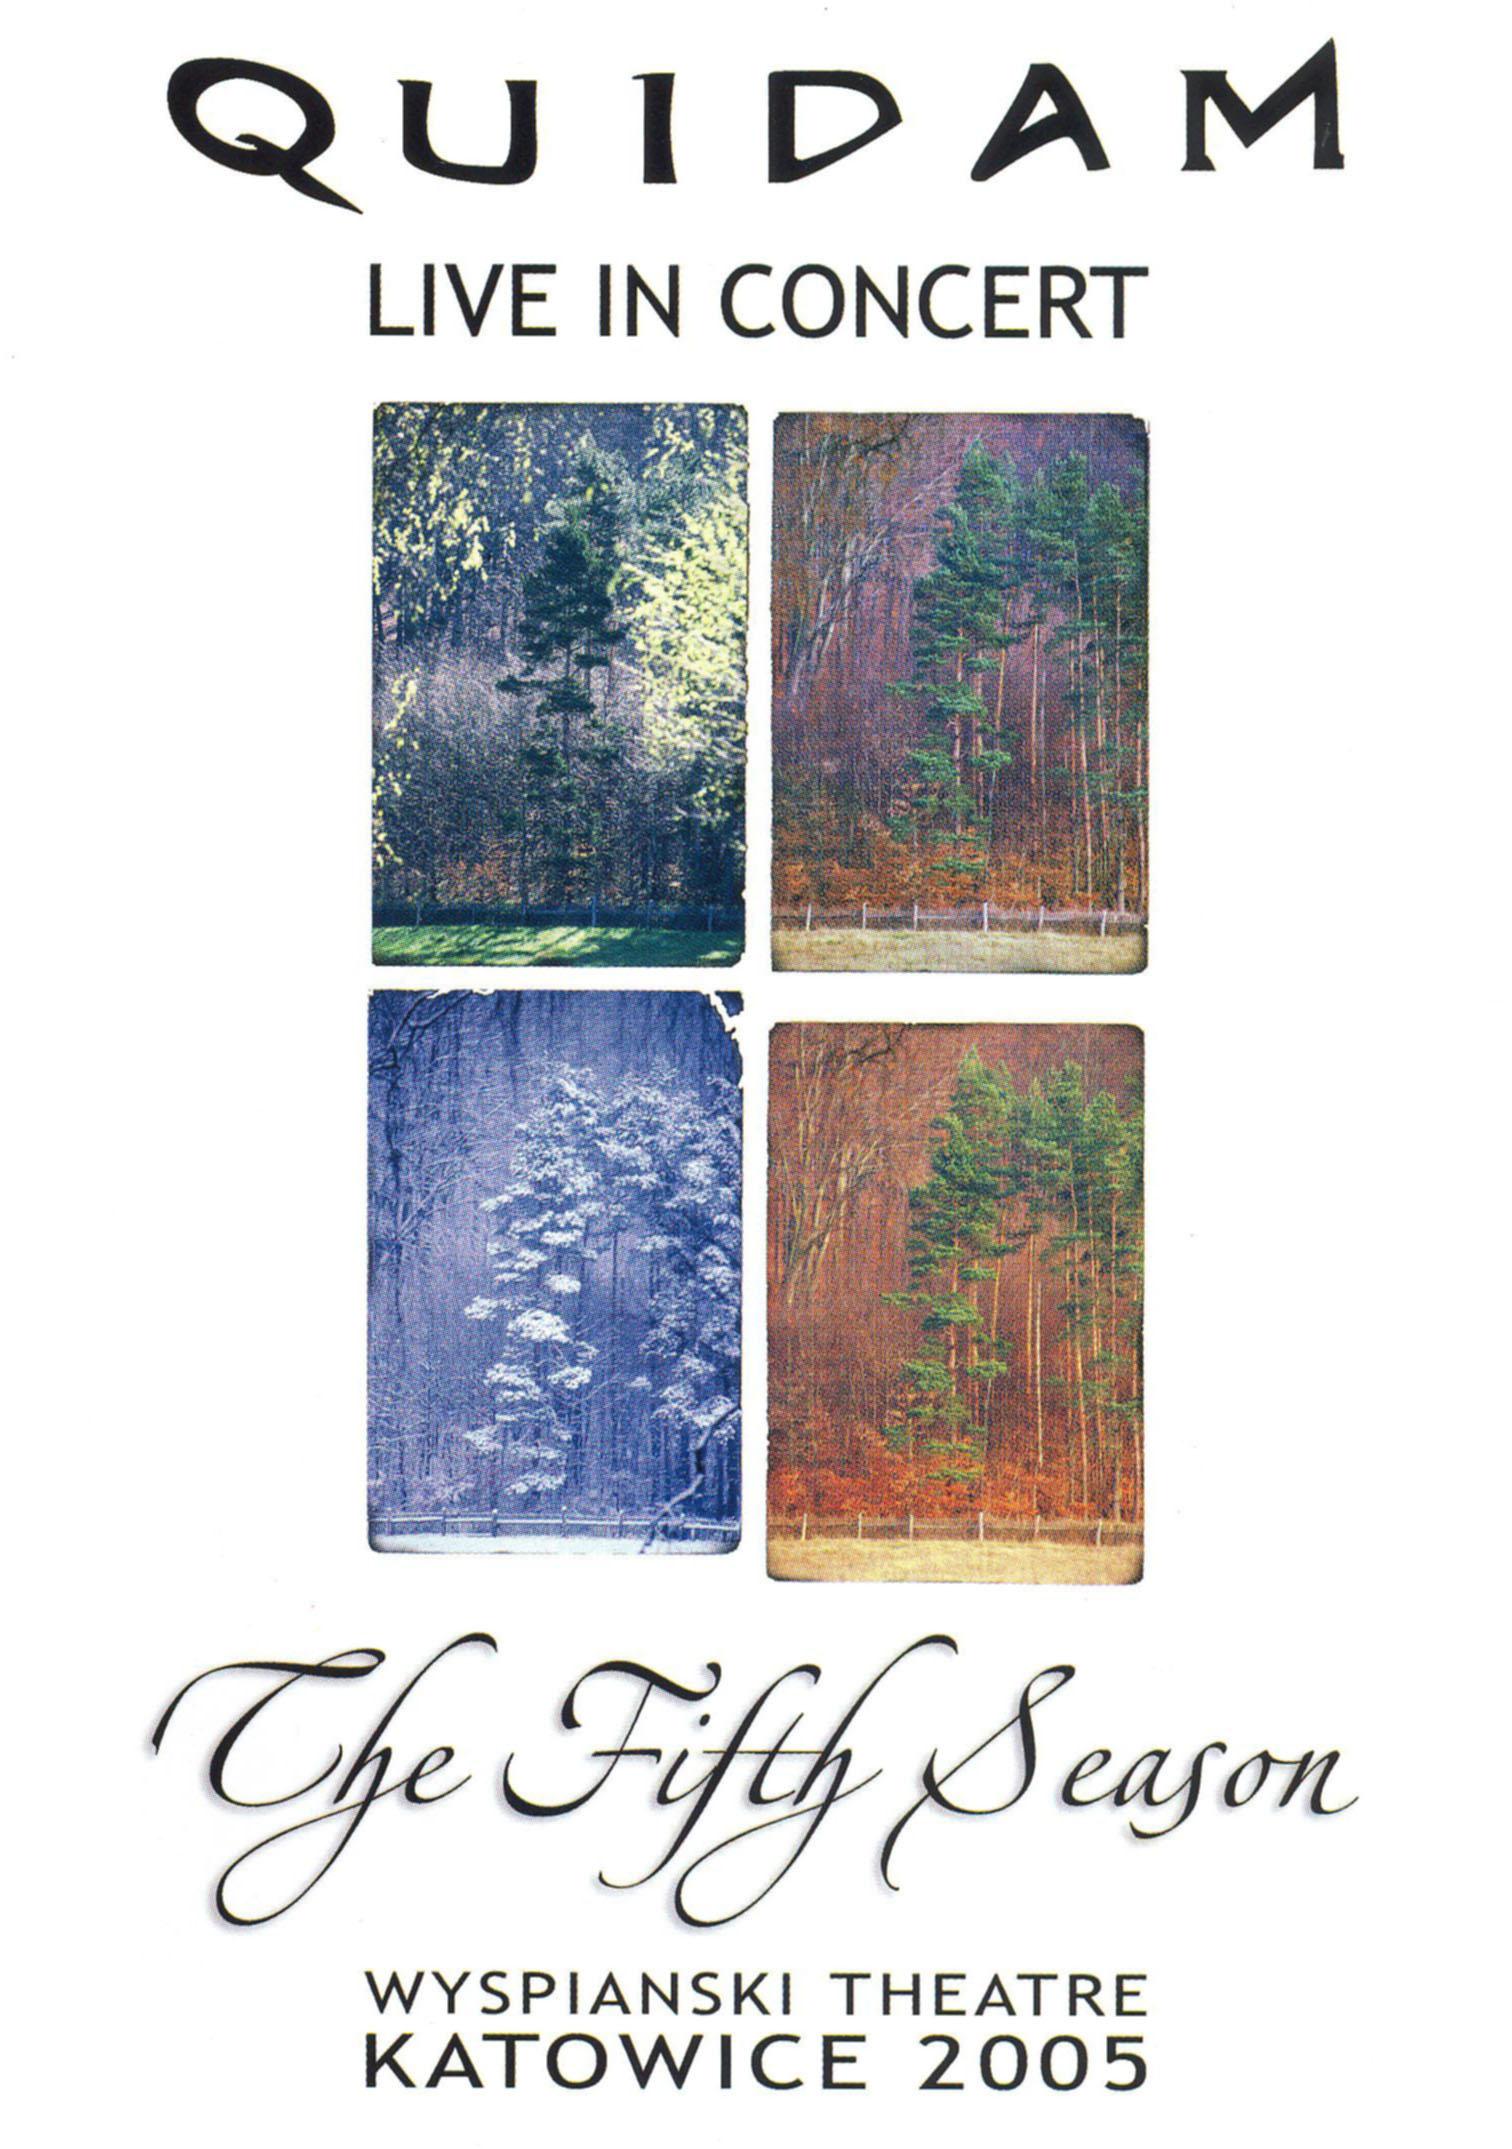 Quidam: Live in Concert - The Fifth Season